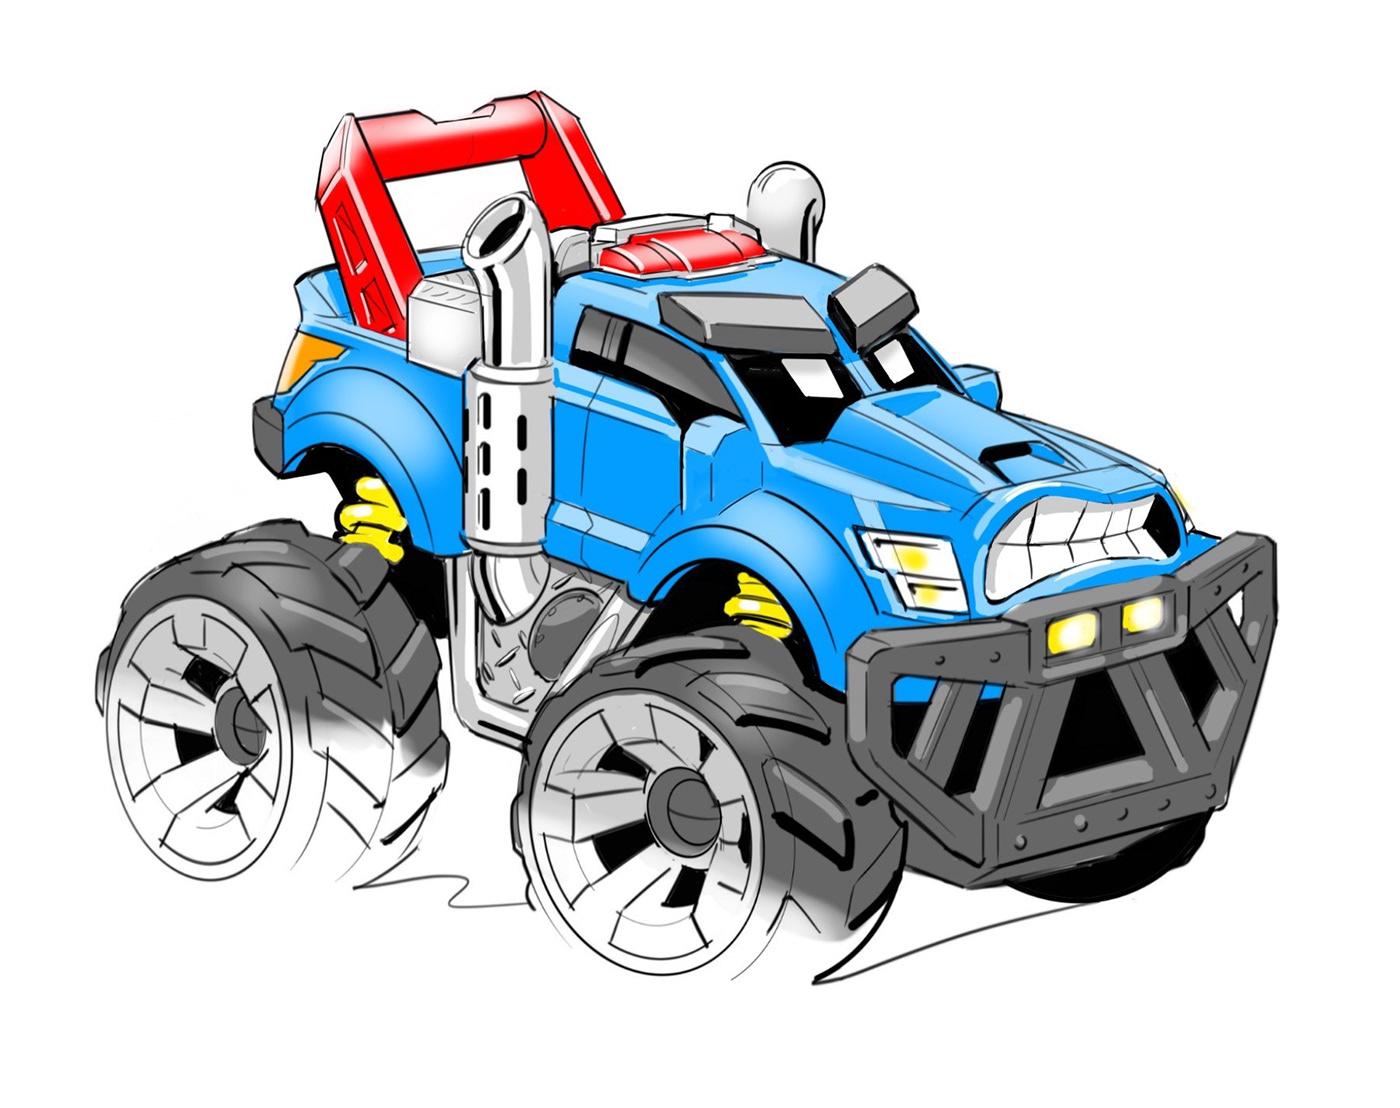 toy vehicles hot rods ratfink trucks motorcycles